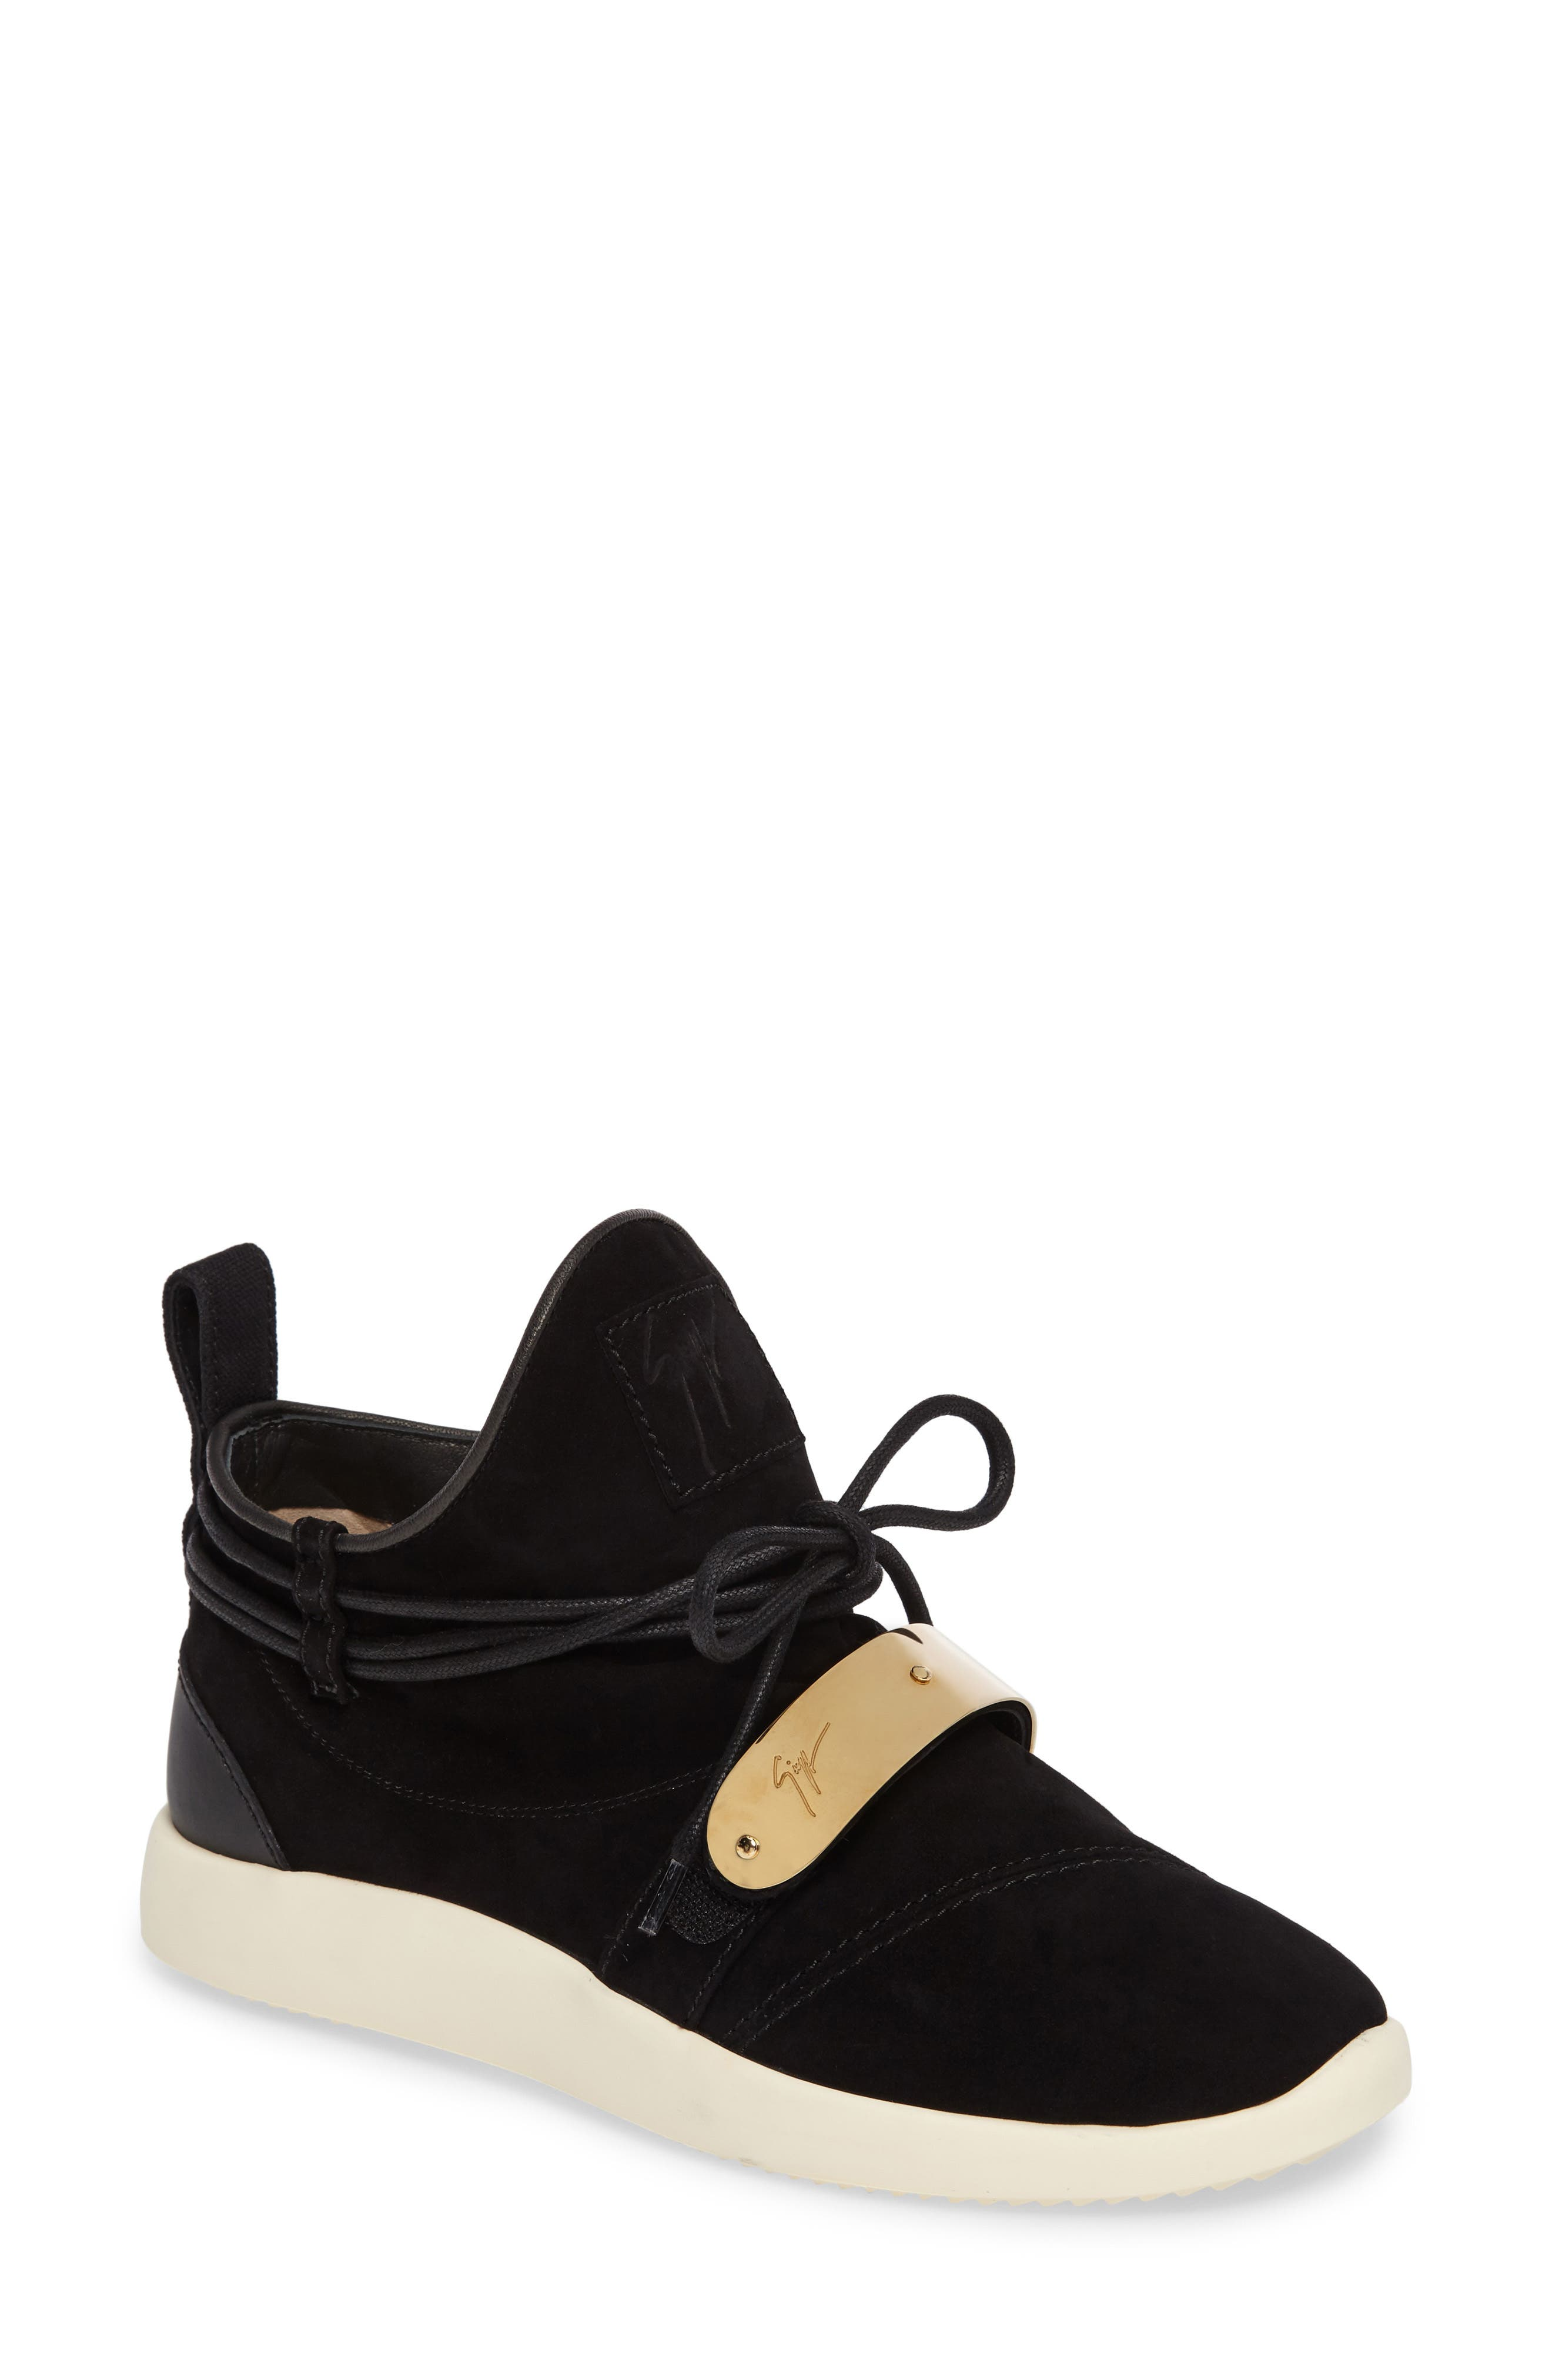 Gold Band Sneaker,                         Main,                         color, Black